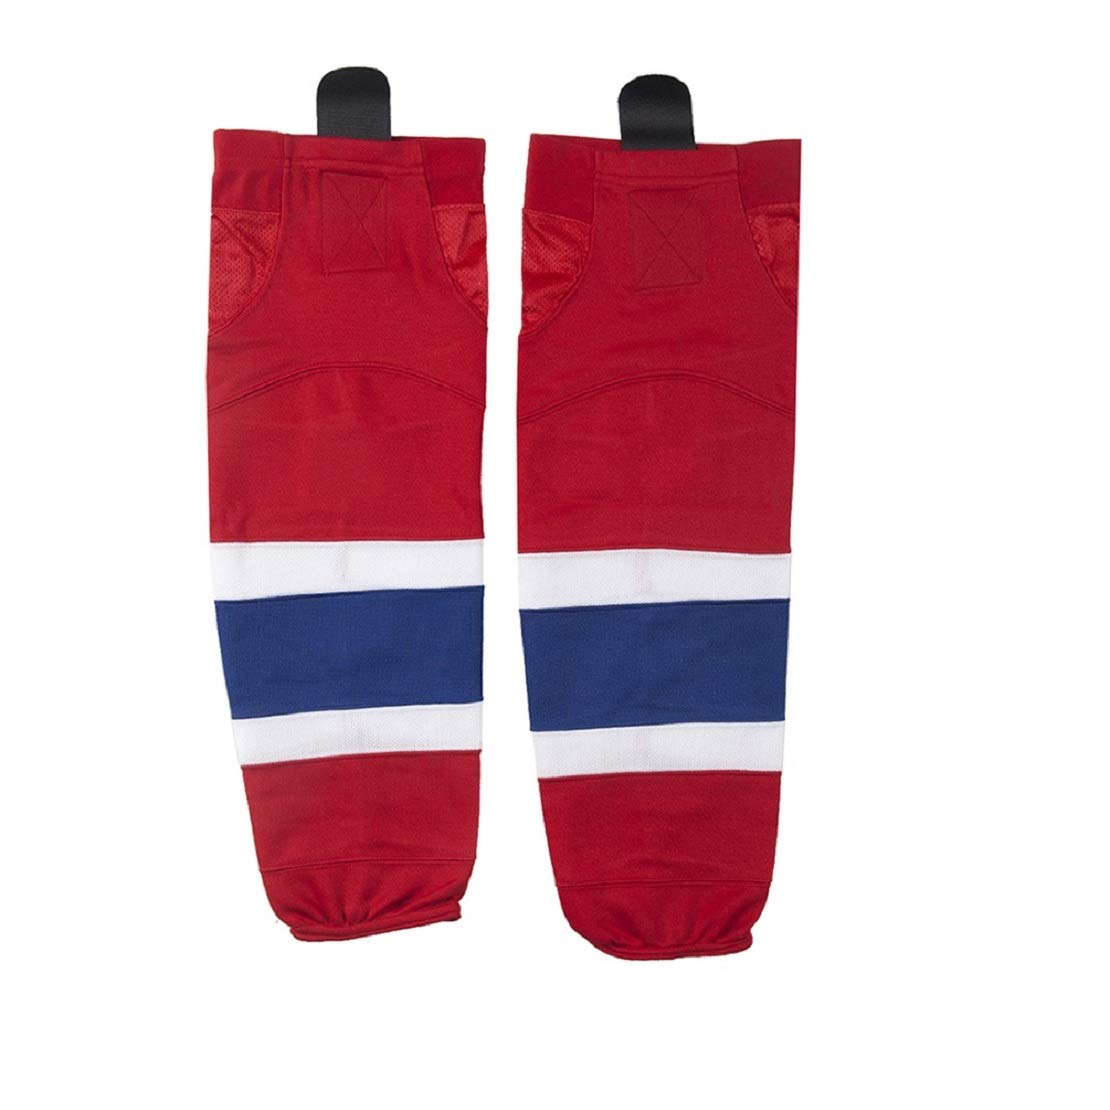 COLDINDOOR Youth Hokcey Socks, Kids Junior School Practice Ice Hockey Socks XS Red by COLDINDOOR